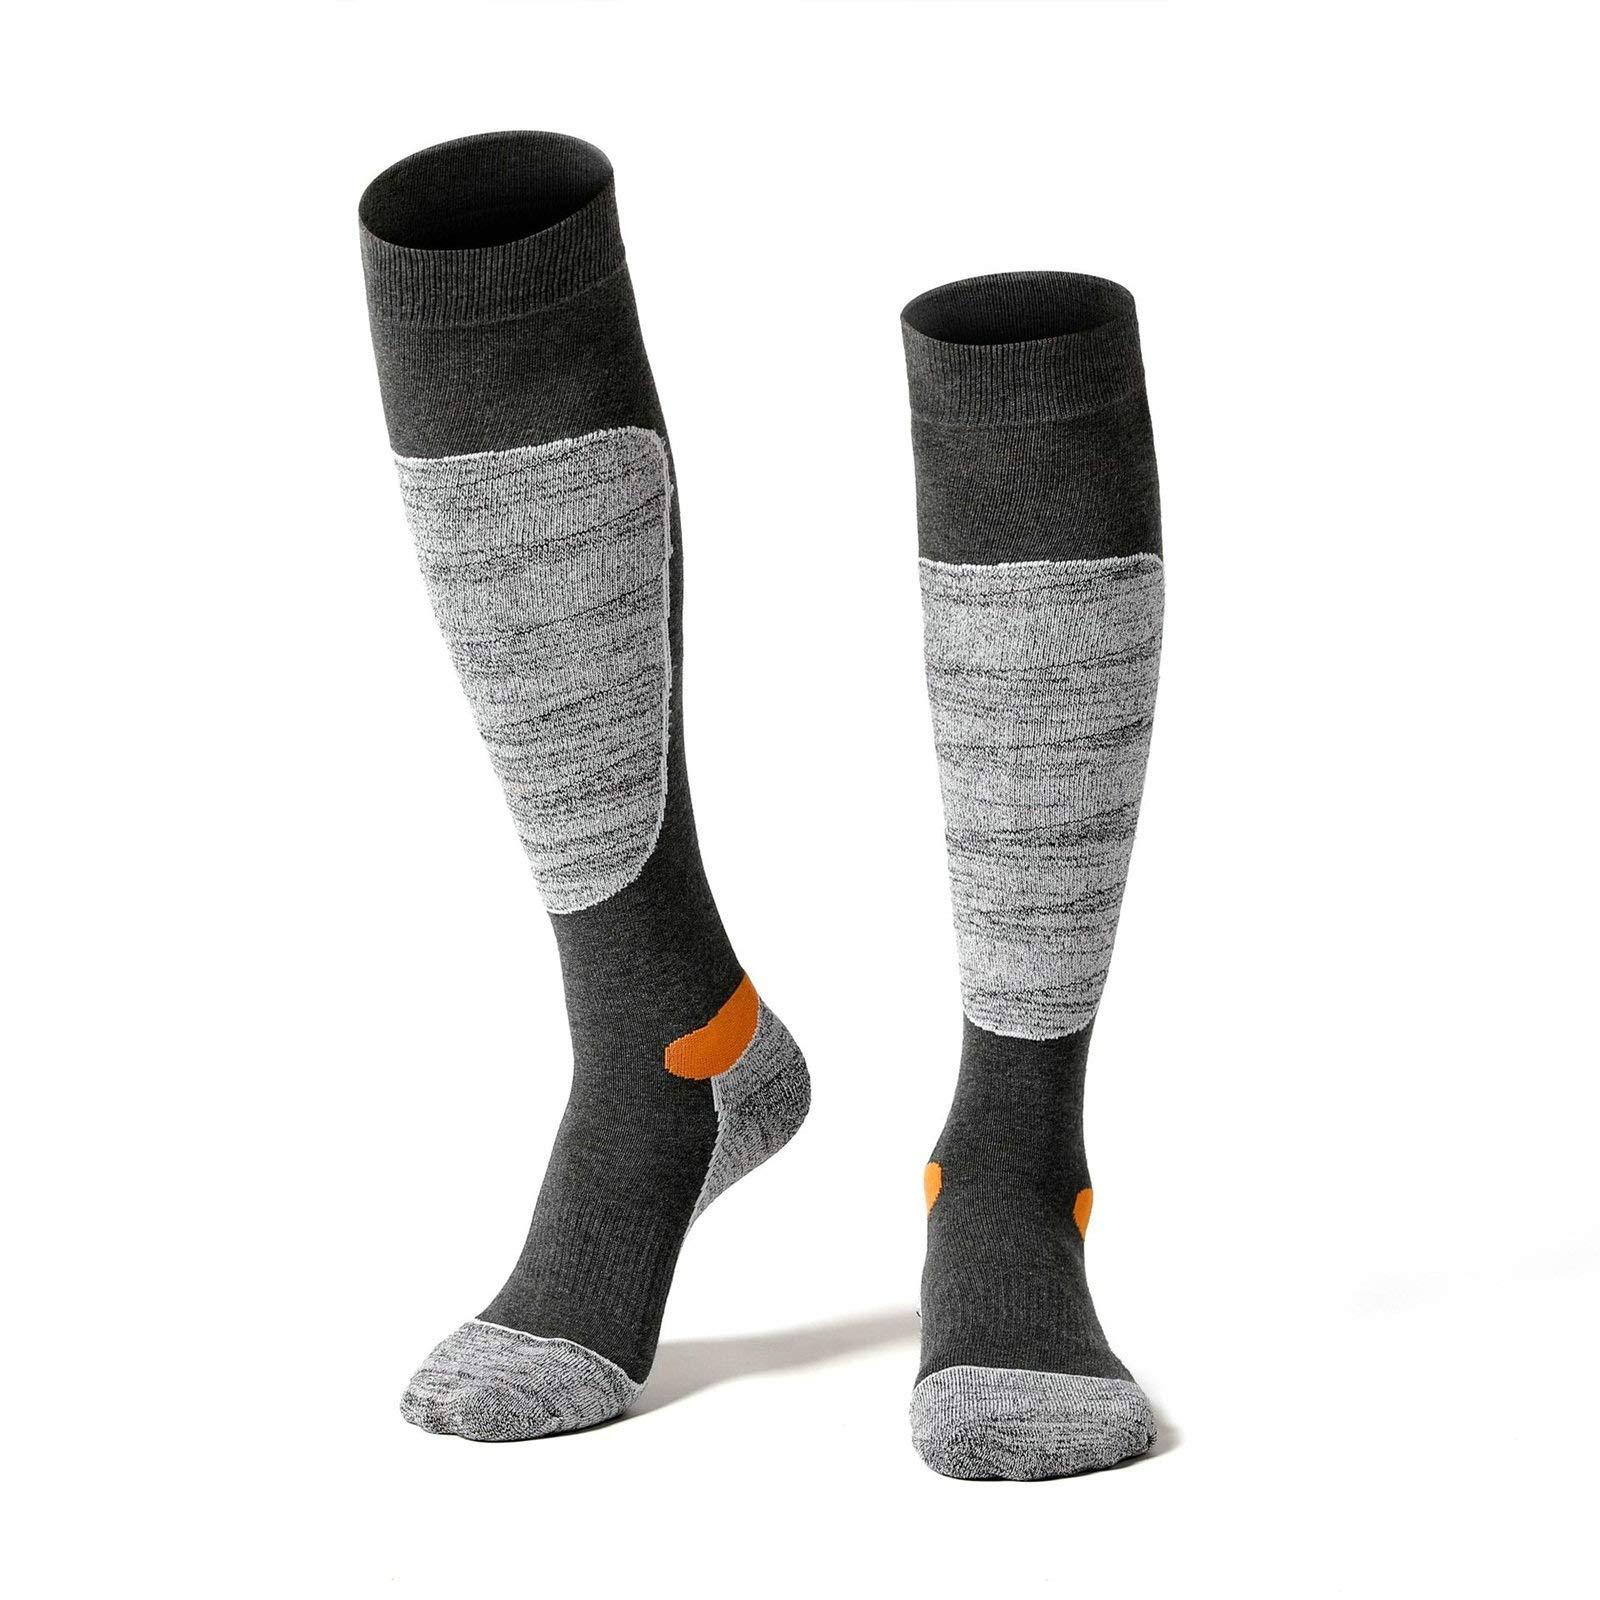 Socks Long Tube Ski Socks Thick Towel Socks Slip Insulation Sports Socks 3 Pairs Gray Gray